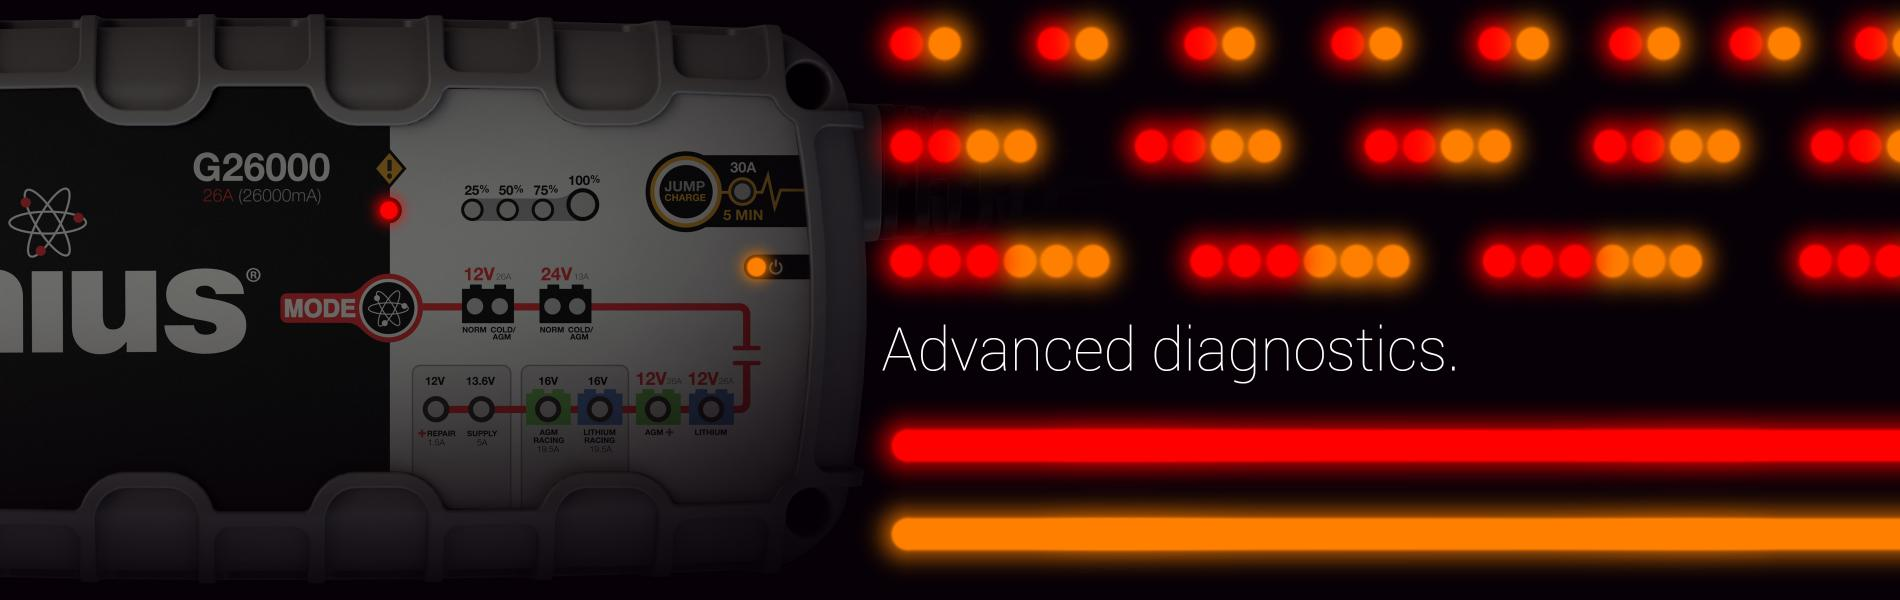 g26000-12v-16v-24v-portable-automotive-car-battery-charger-maintainer-advanced-diagnostics.jpg